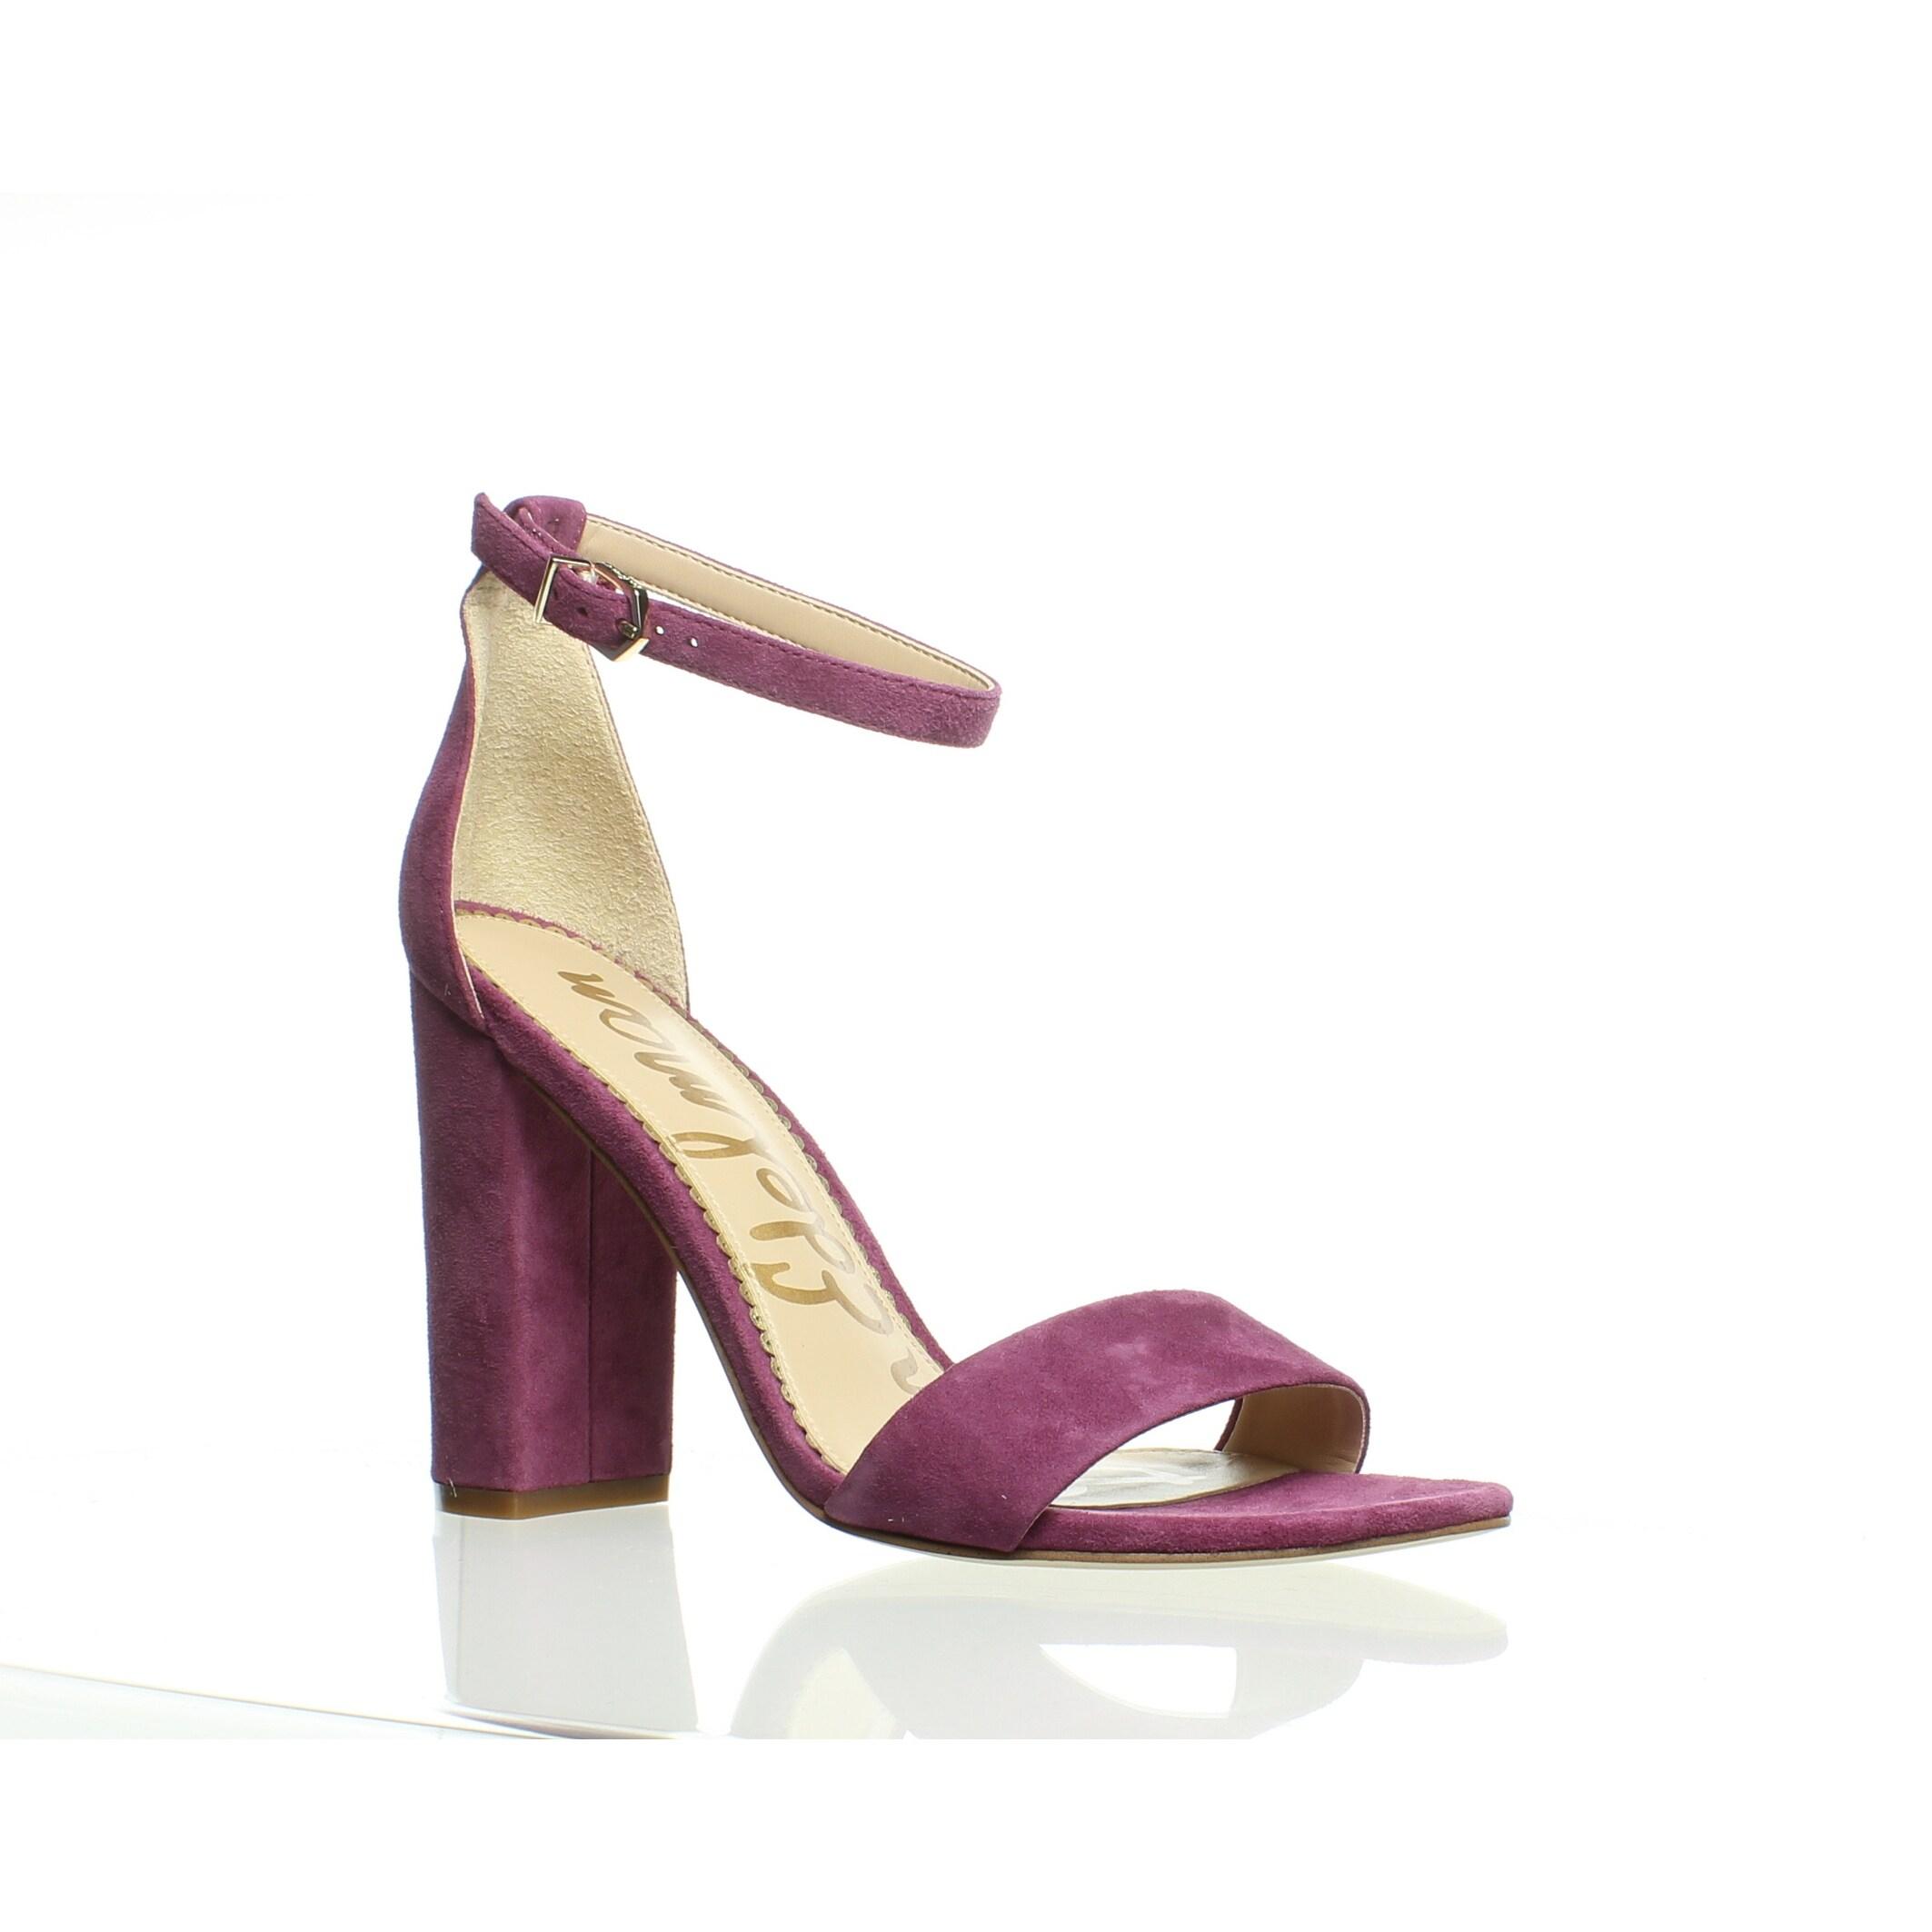 48a9d9f943e1 Shop Sam Edelman Womens Yaro Mulberry Pink Sandals Size 7.5 - Free ...